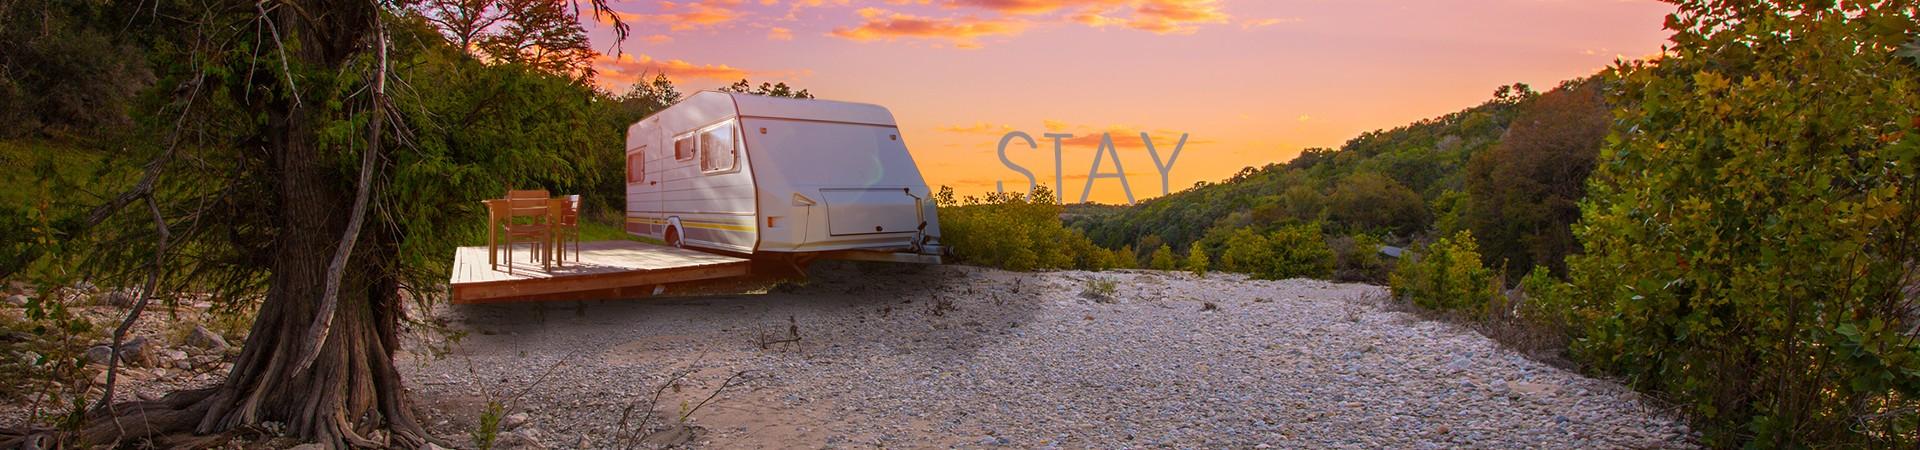 travel trailer RV set up at Hamiliton's Pool in Texas